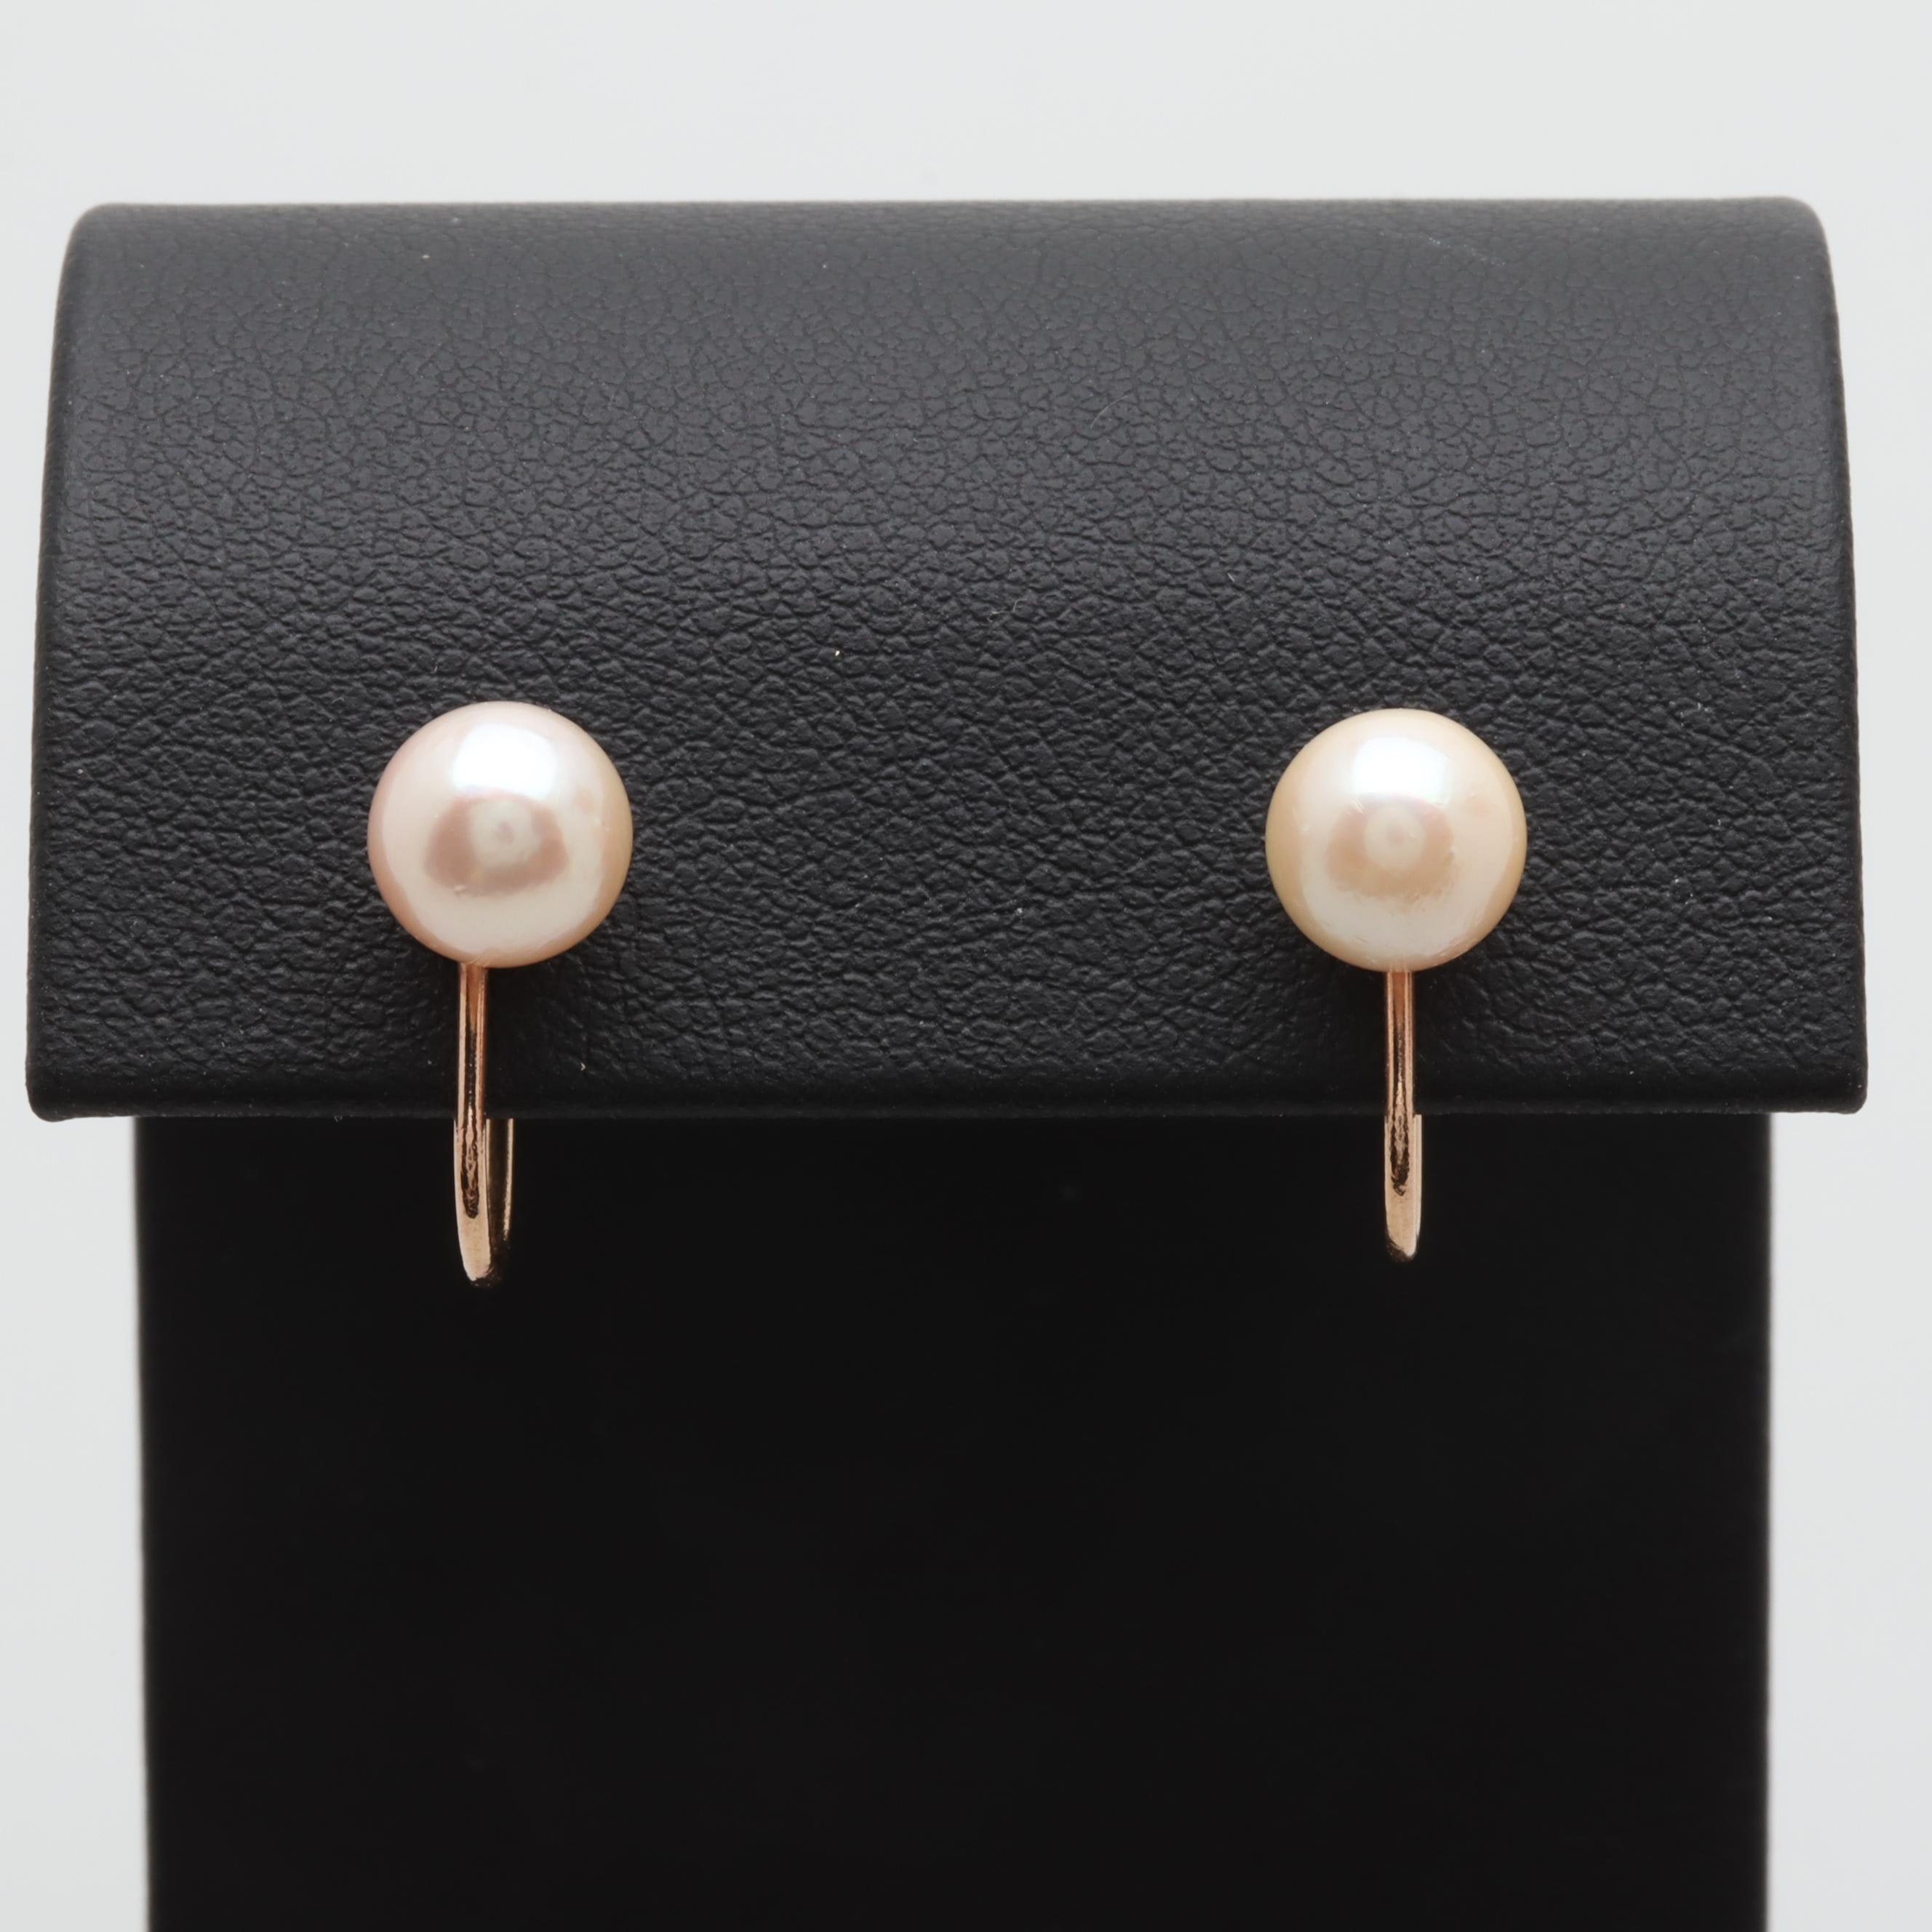 14K Yellow Gold Cultured Pearl Screwback Earrings